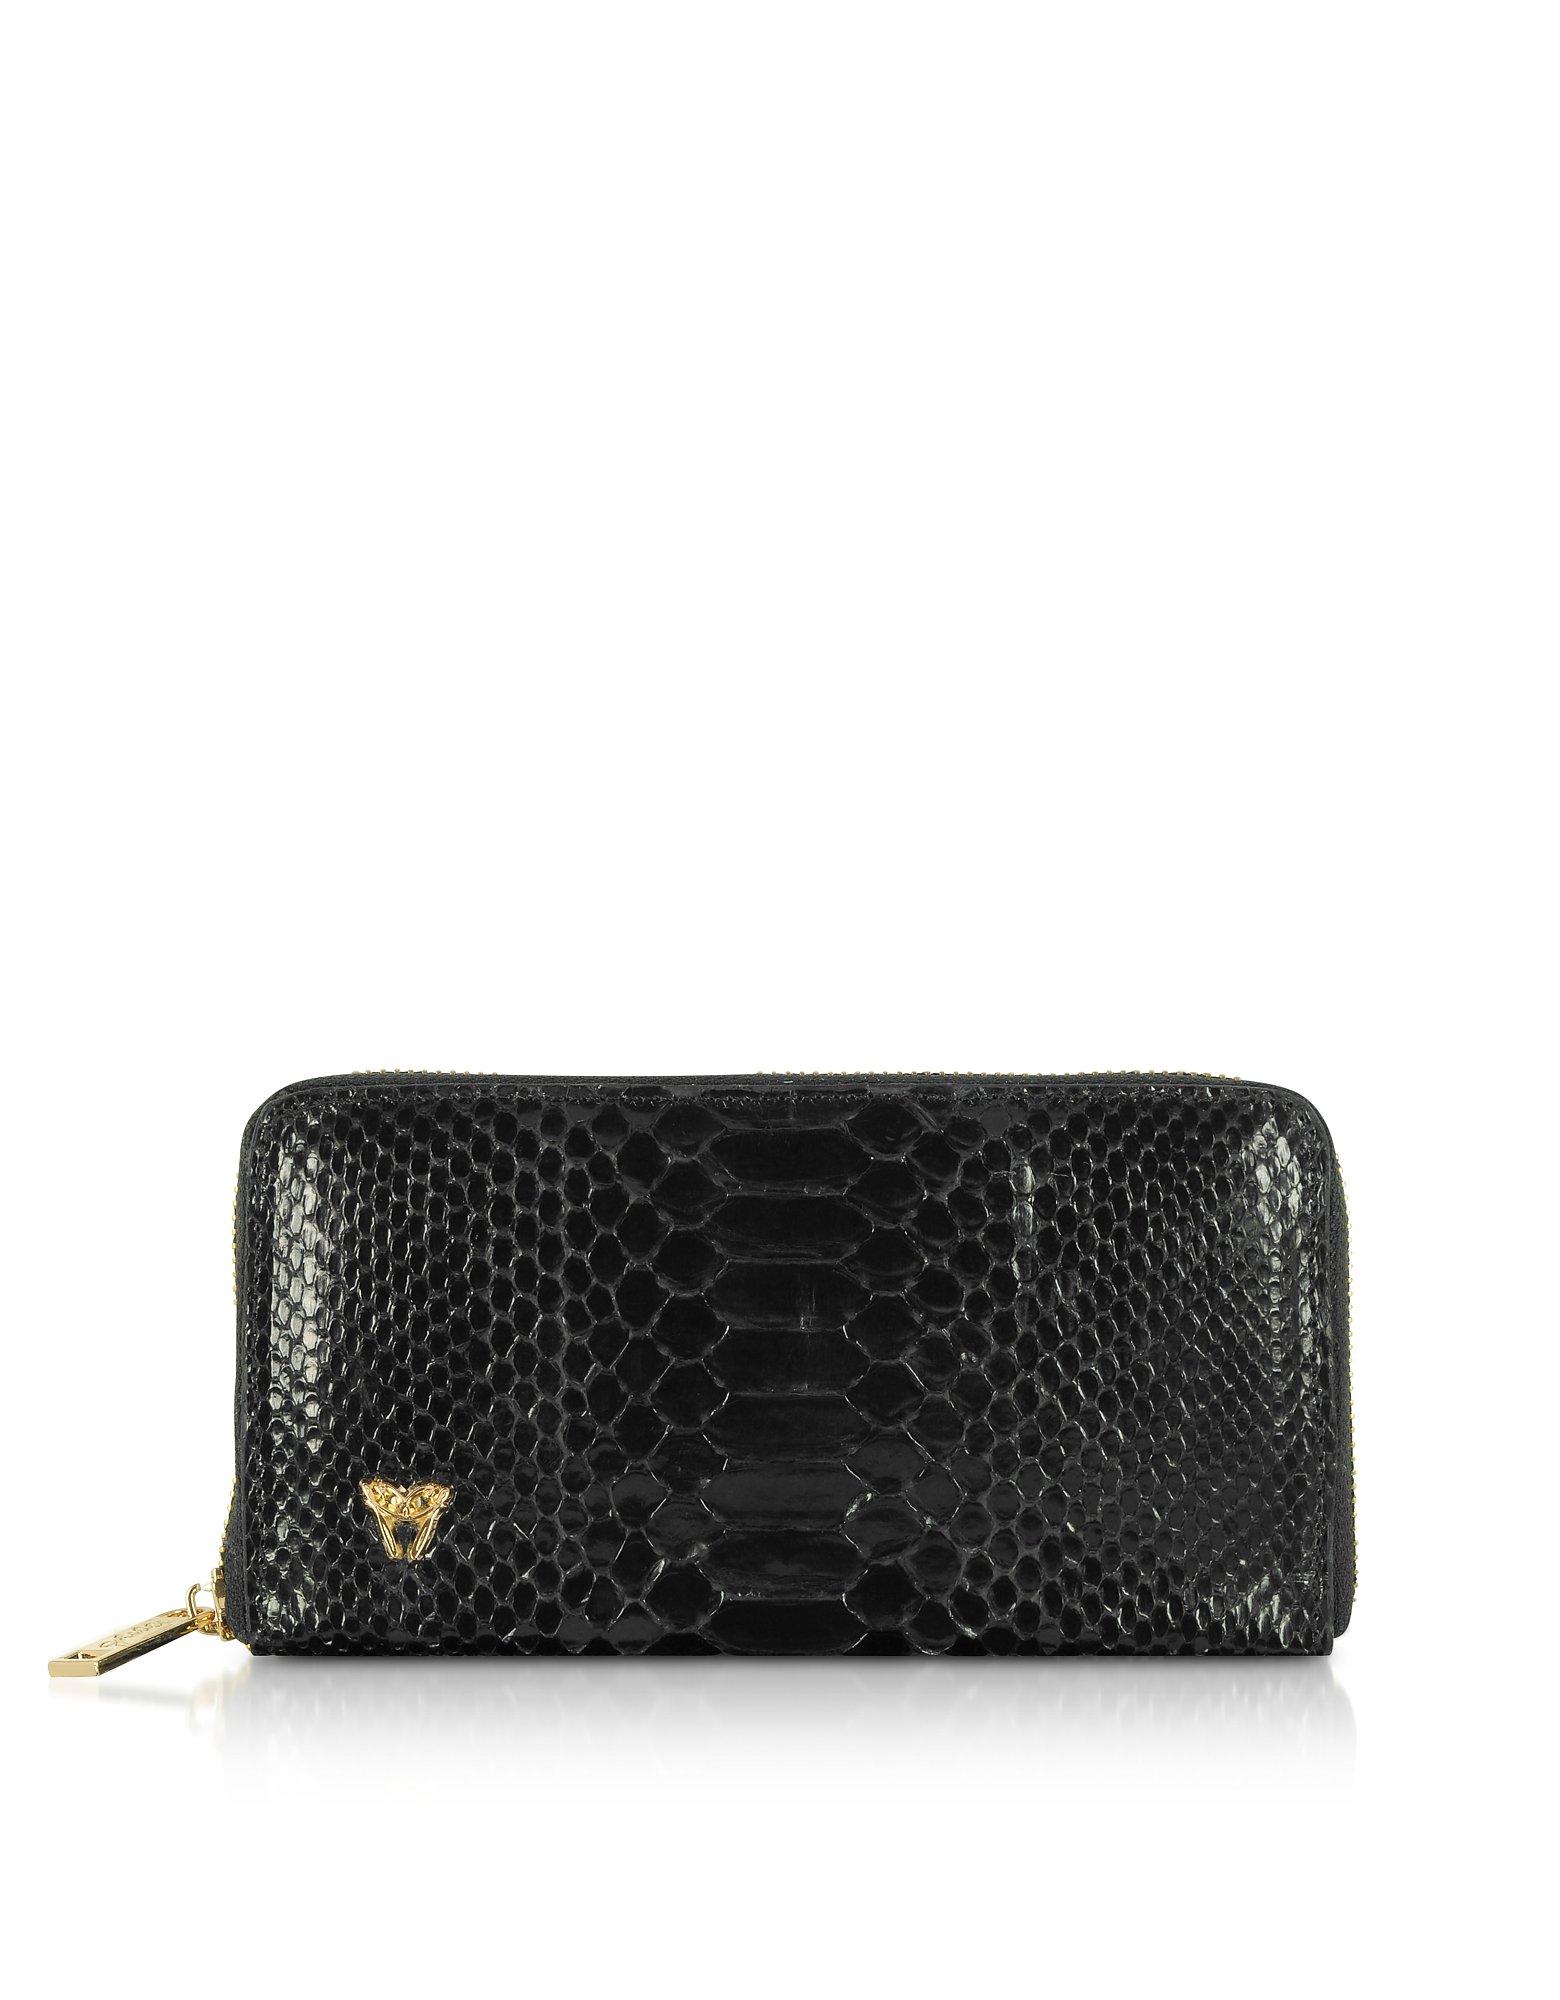 Ghibli Handbags, Glossy Black Python Leather Continental Wallet